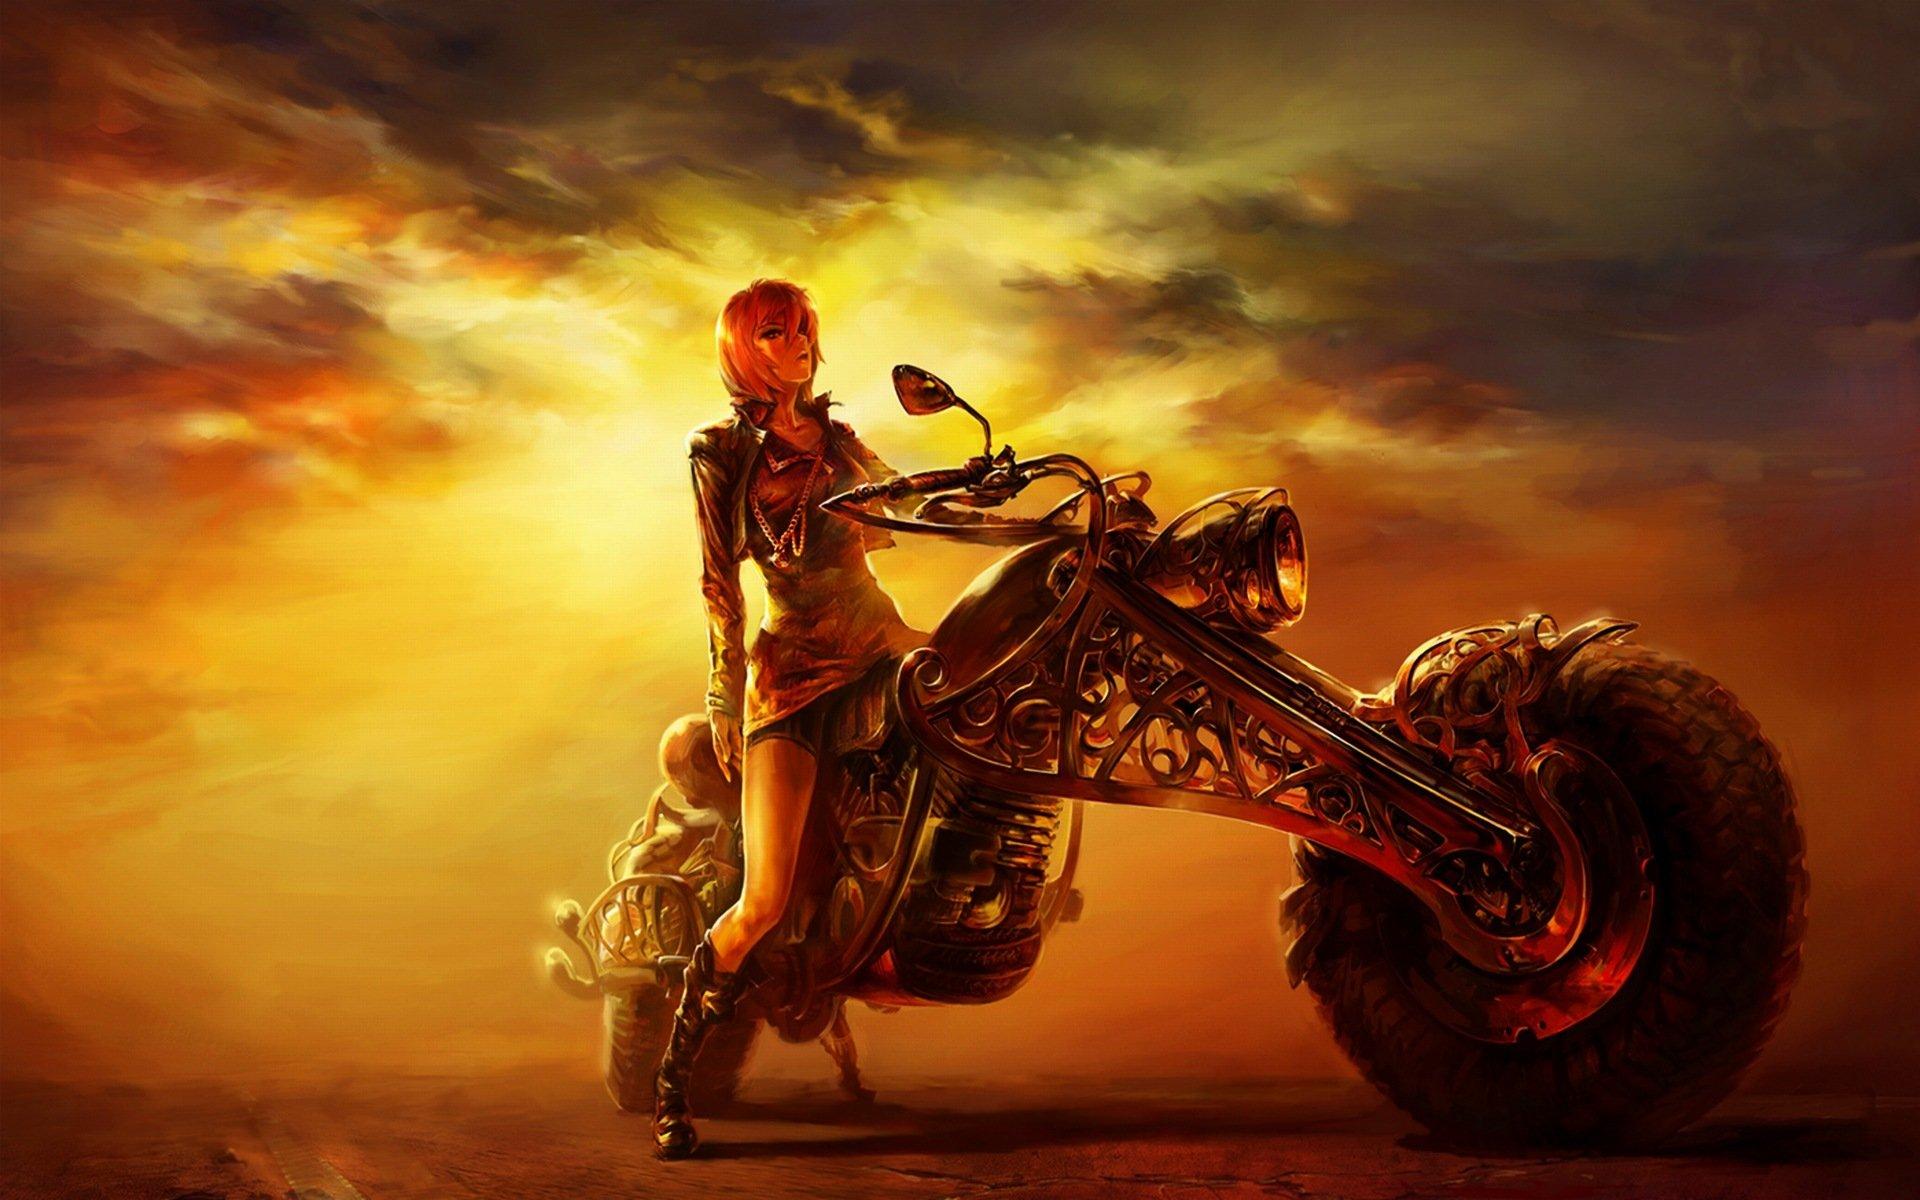 MOTORCYCLE - art girl sunset wallpaper | 1920x1200 ...